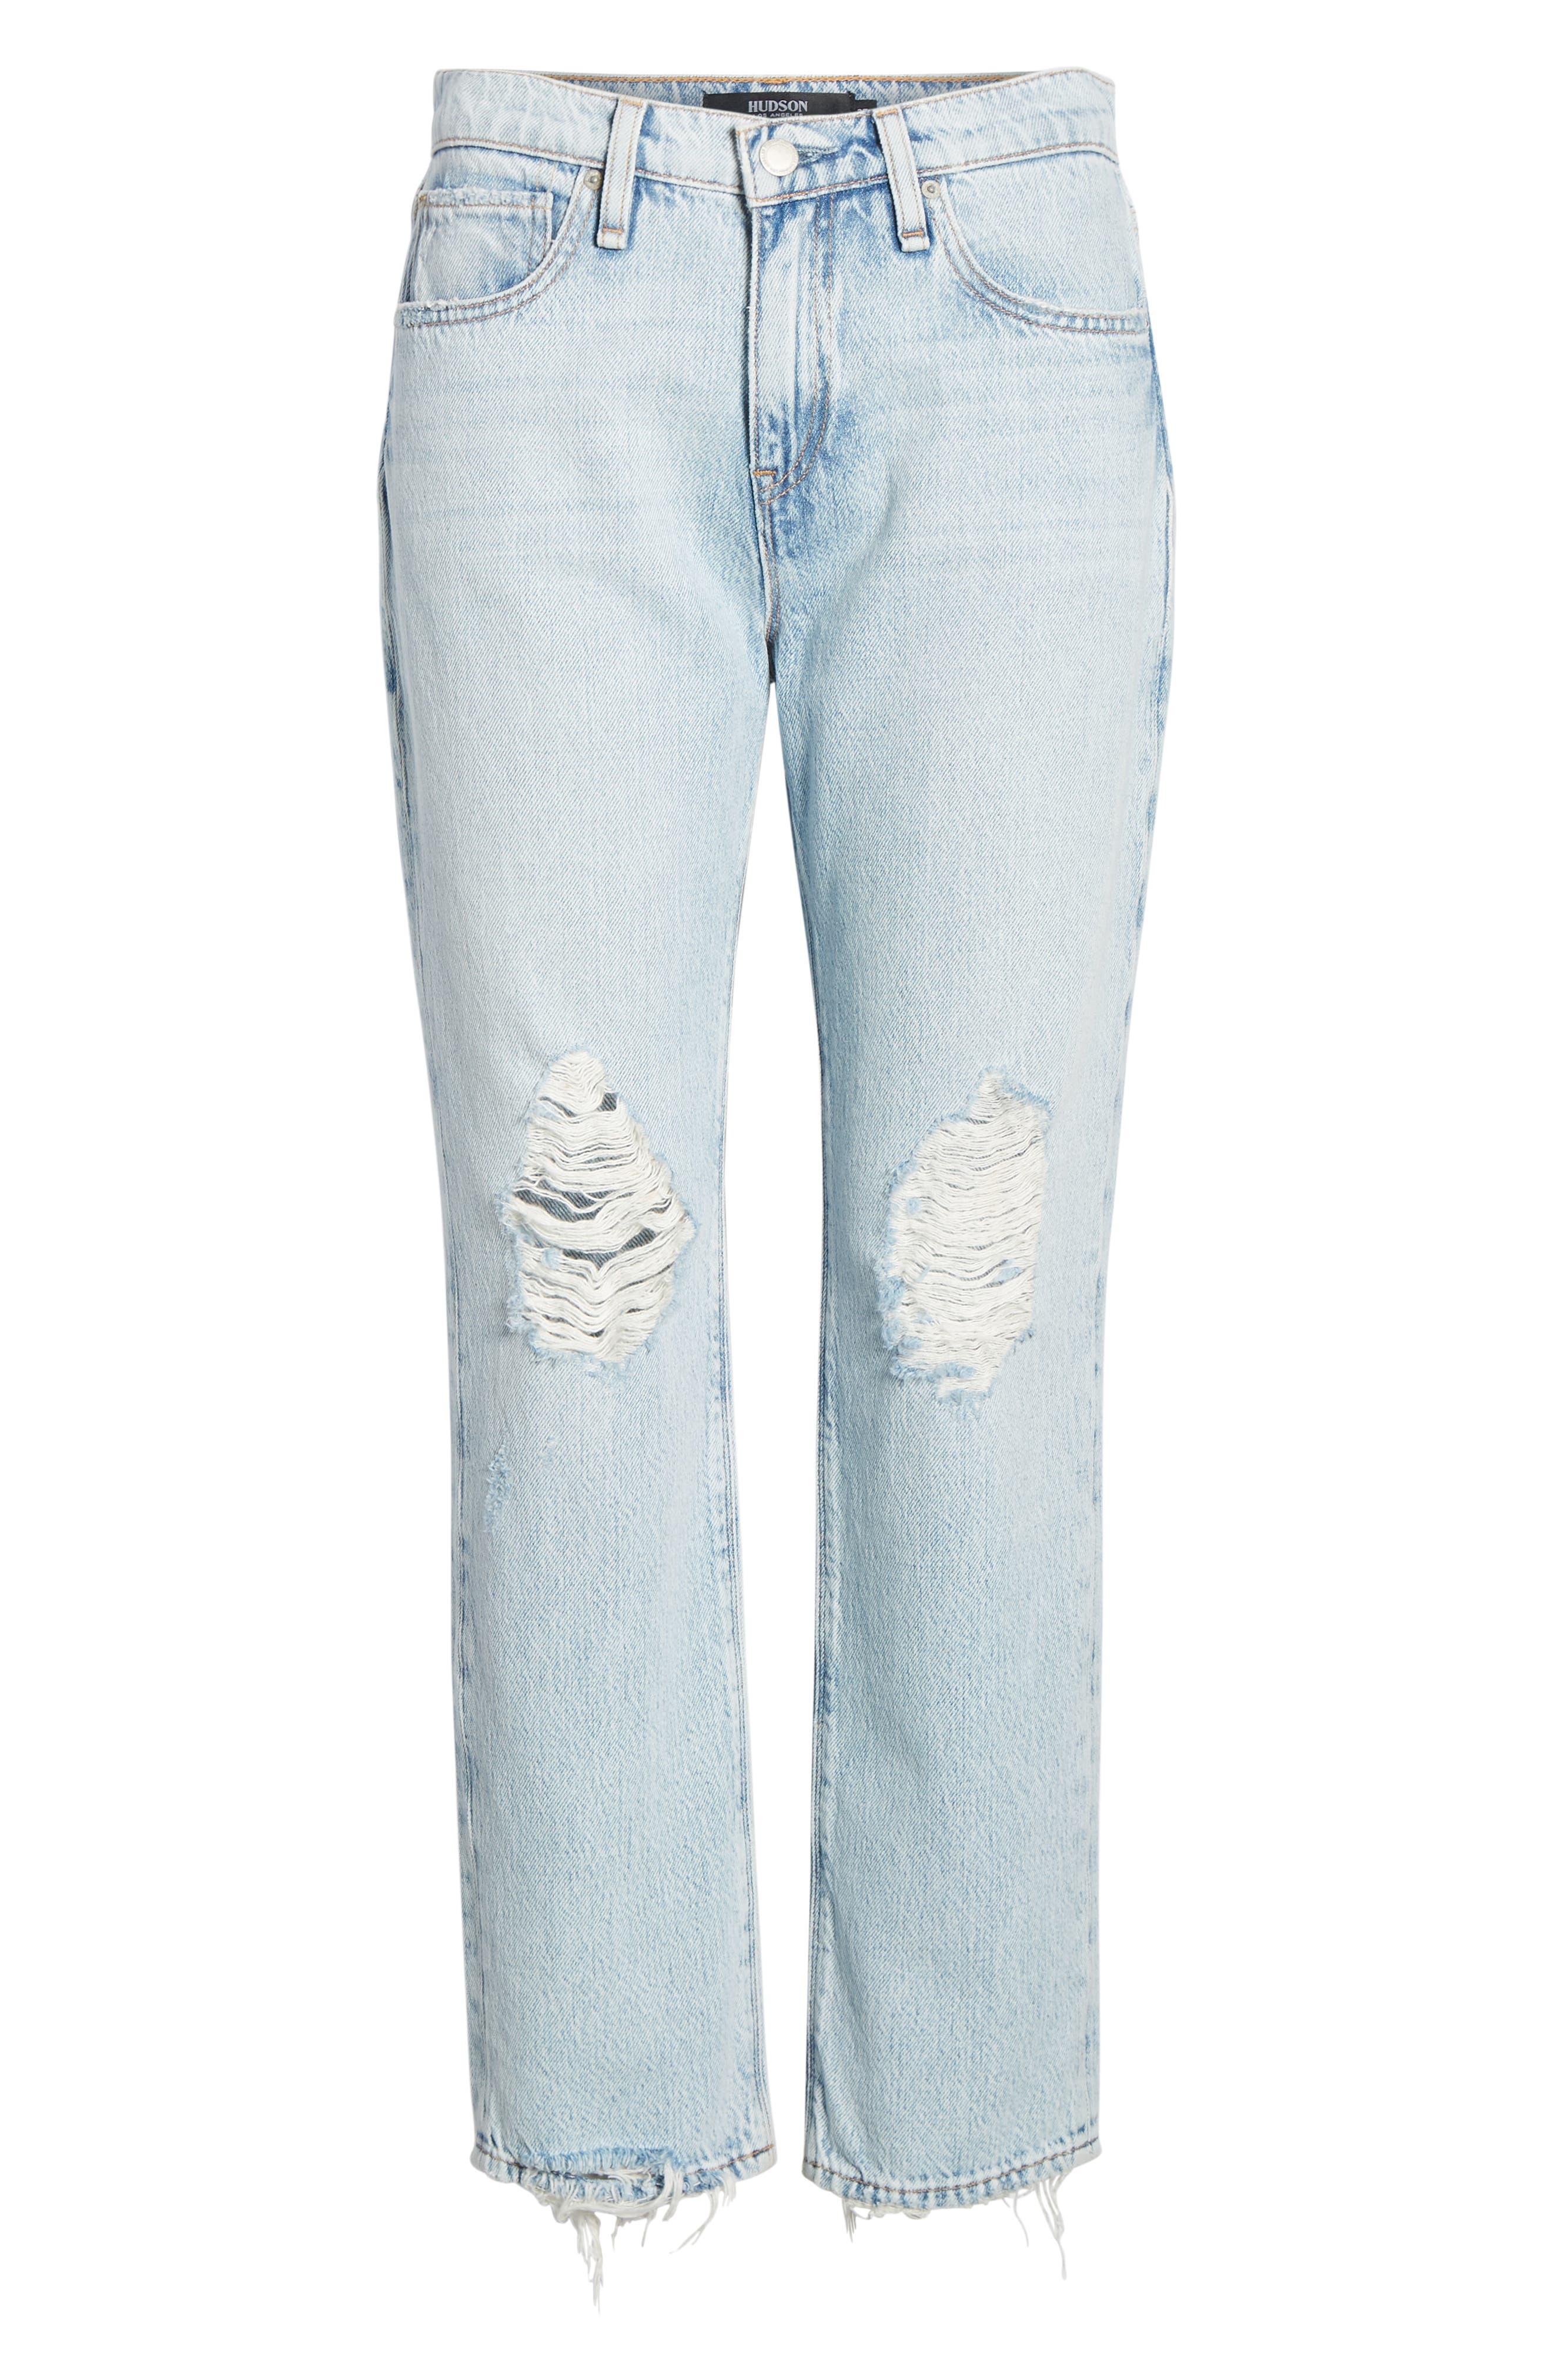 HUDSON JEANS, Jessi Ripped Crop Boyfriend Jeans, Alternate thumbnail 6, color, SAVE TONIGHT